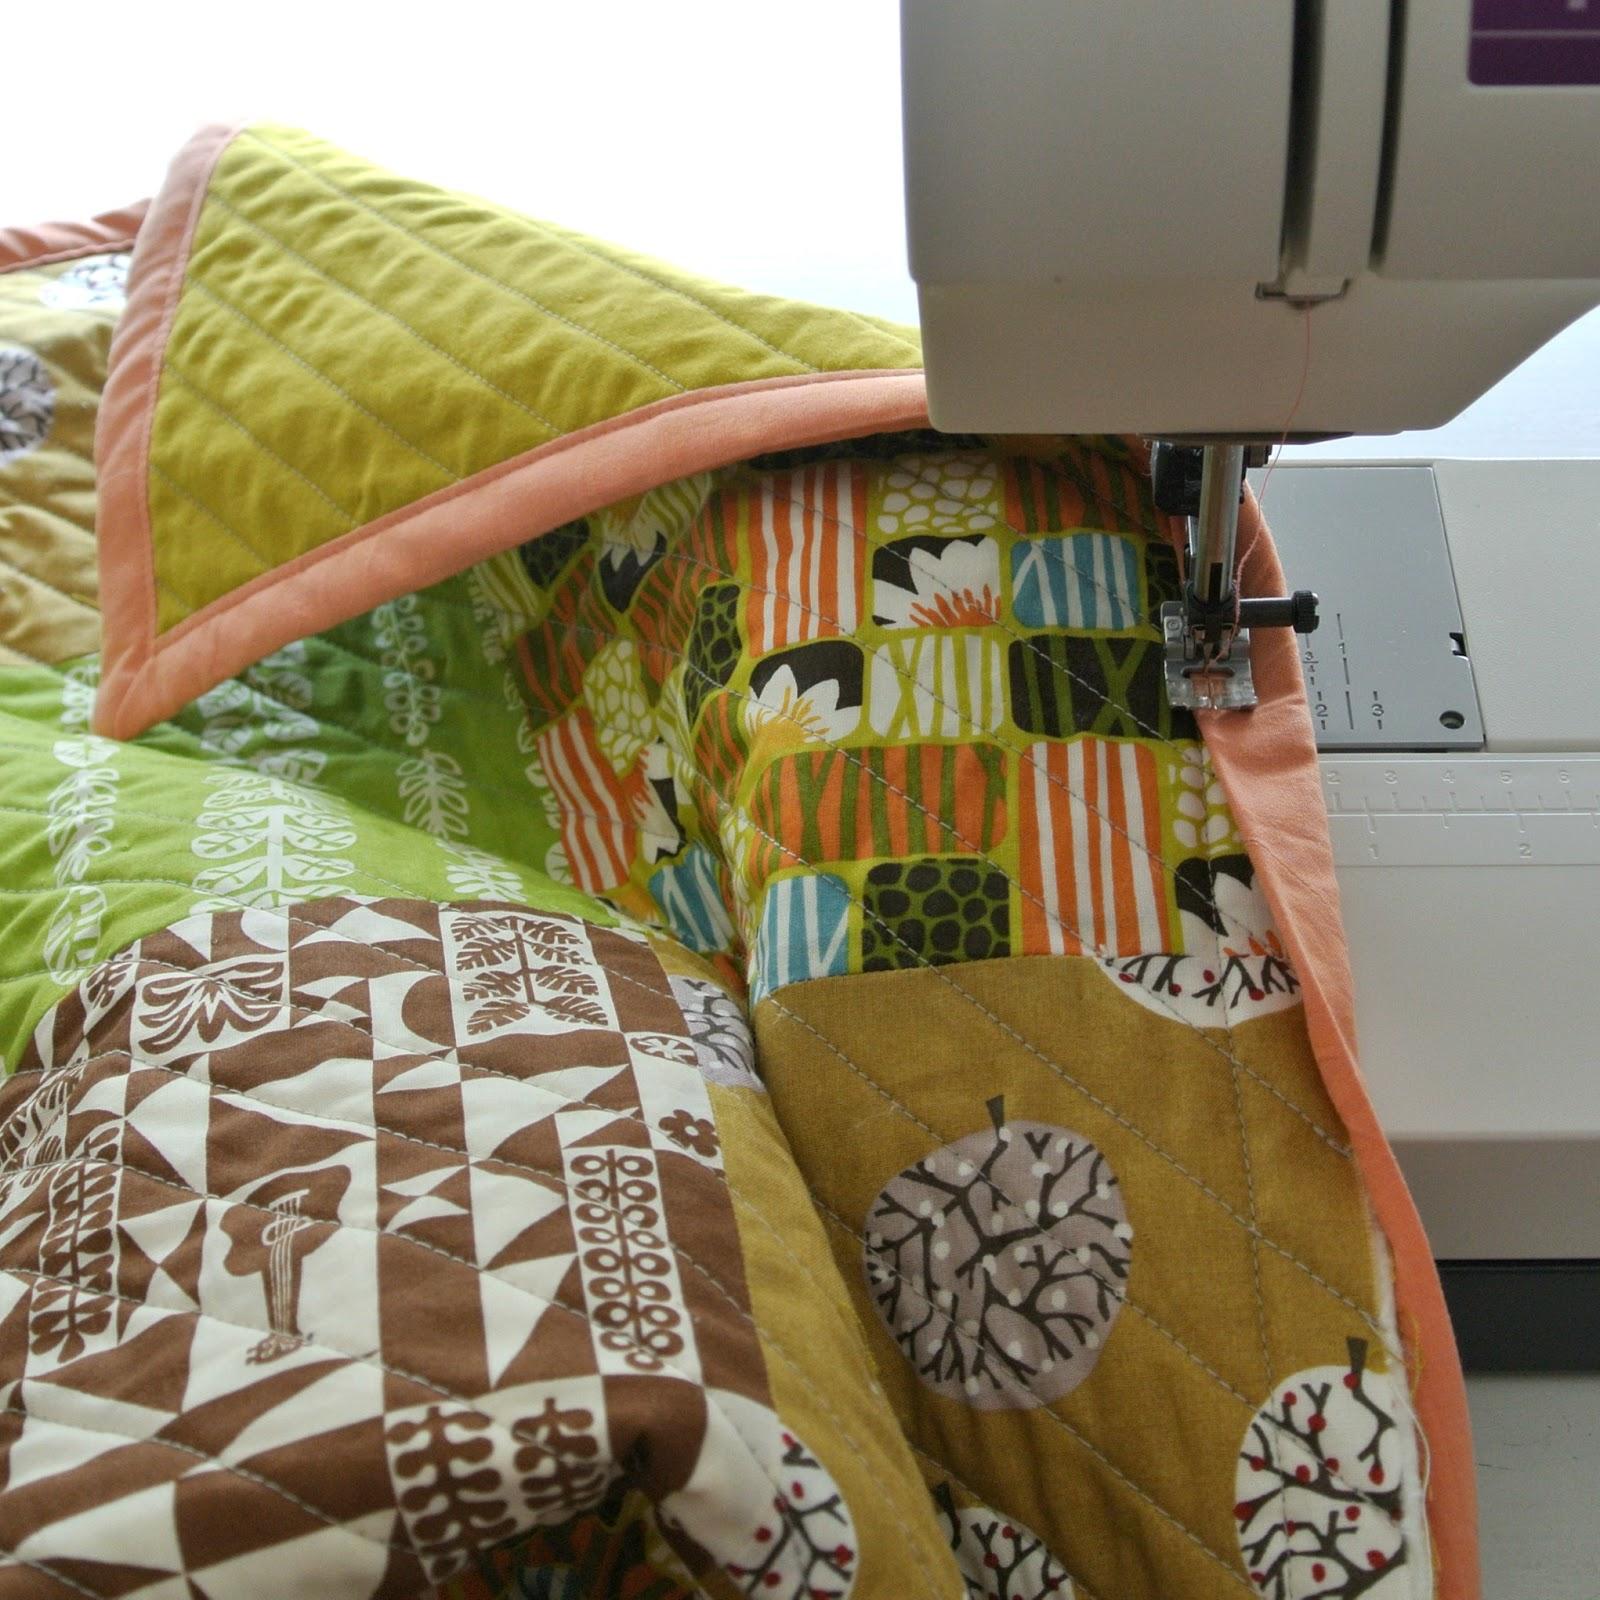 Afwerken Van Een Quilt.By Miekk Easy Quilt Sewalong Dag 6 De Afwerking